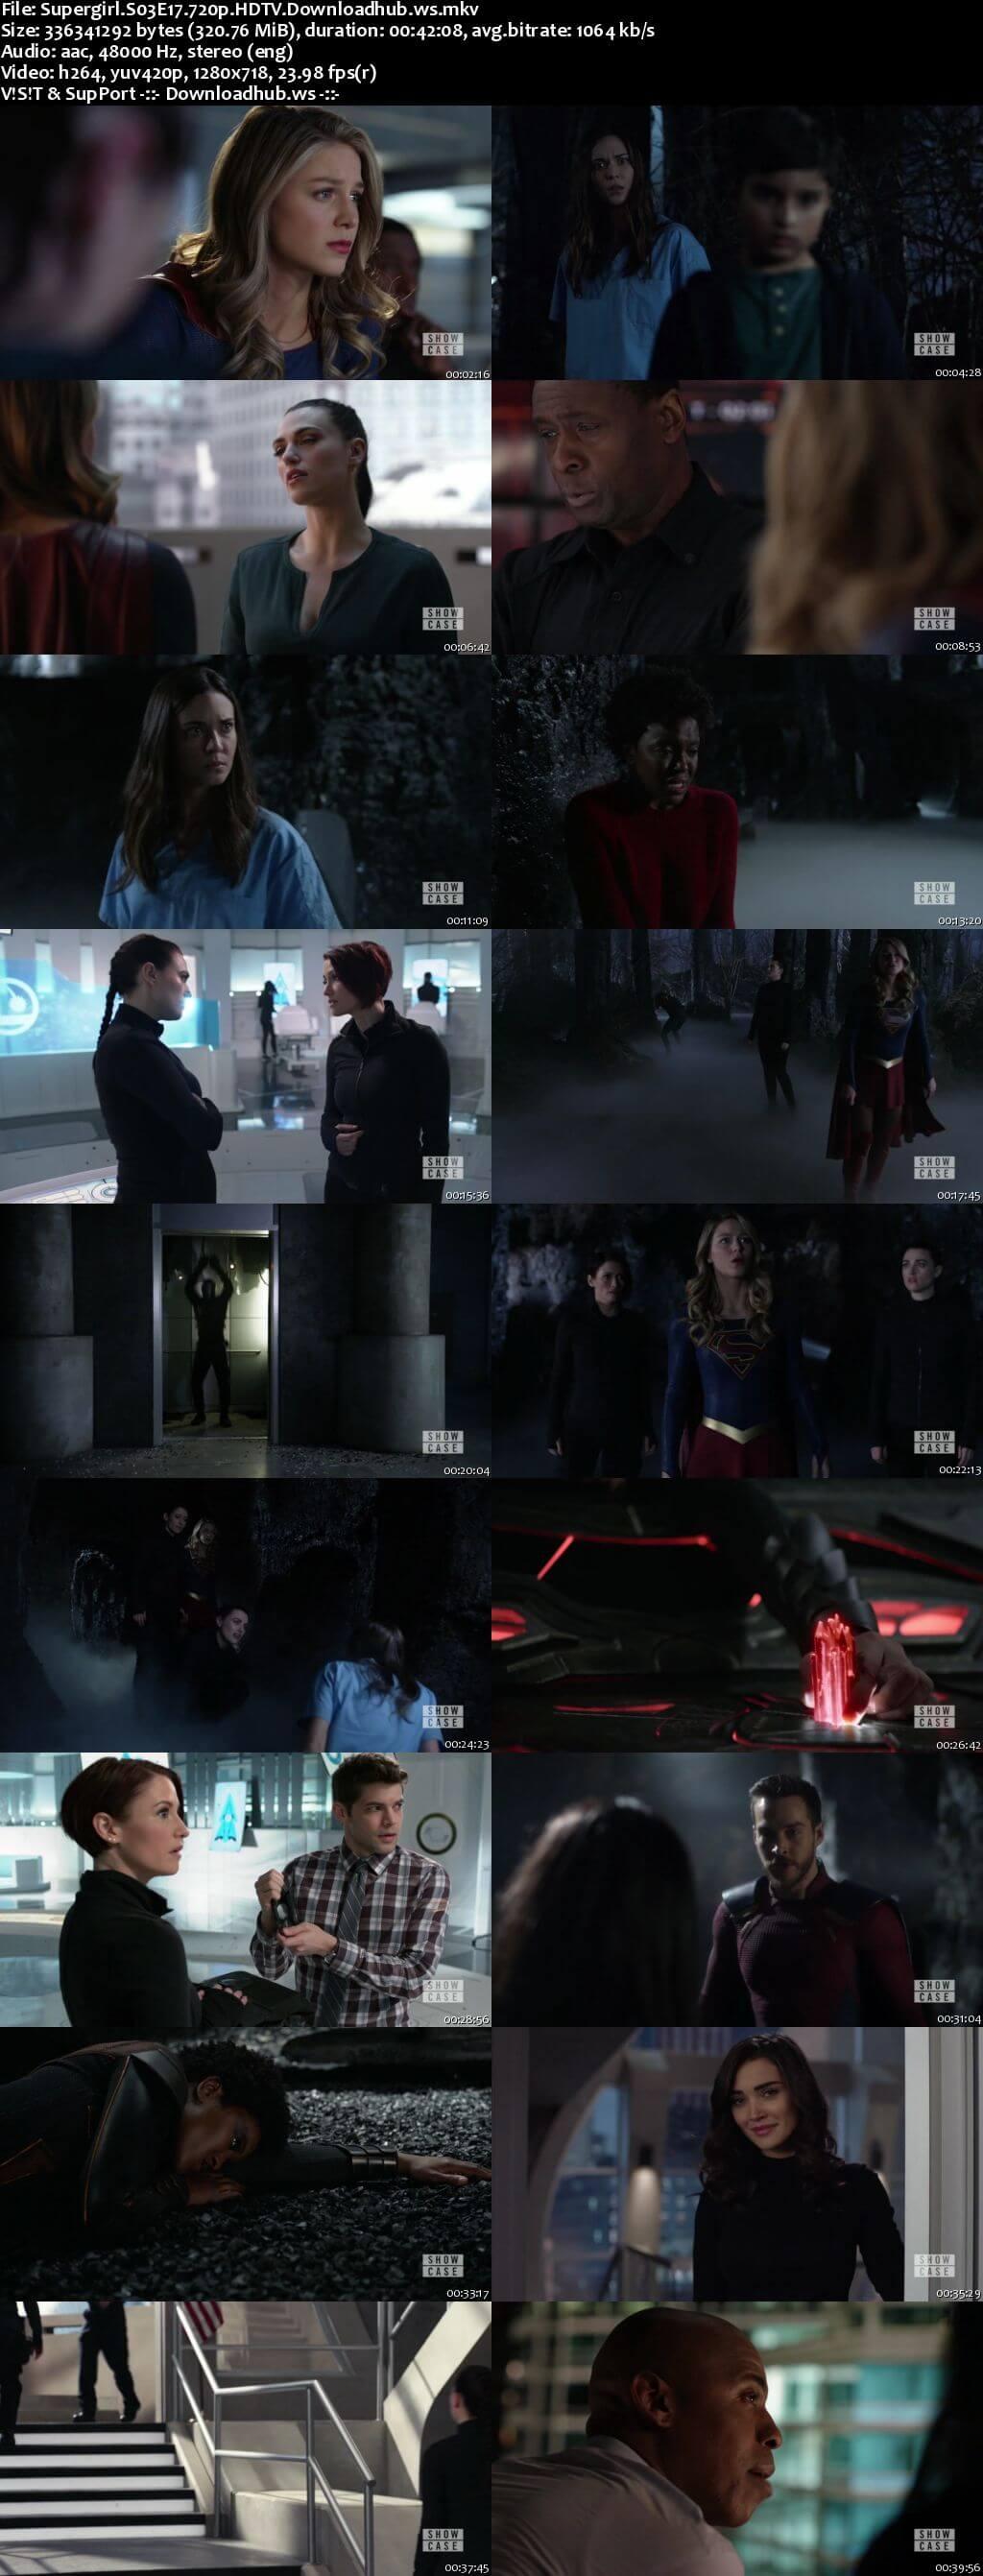 Supergirl S03E17 321MB HDTV 720p x264